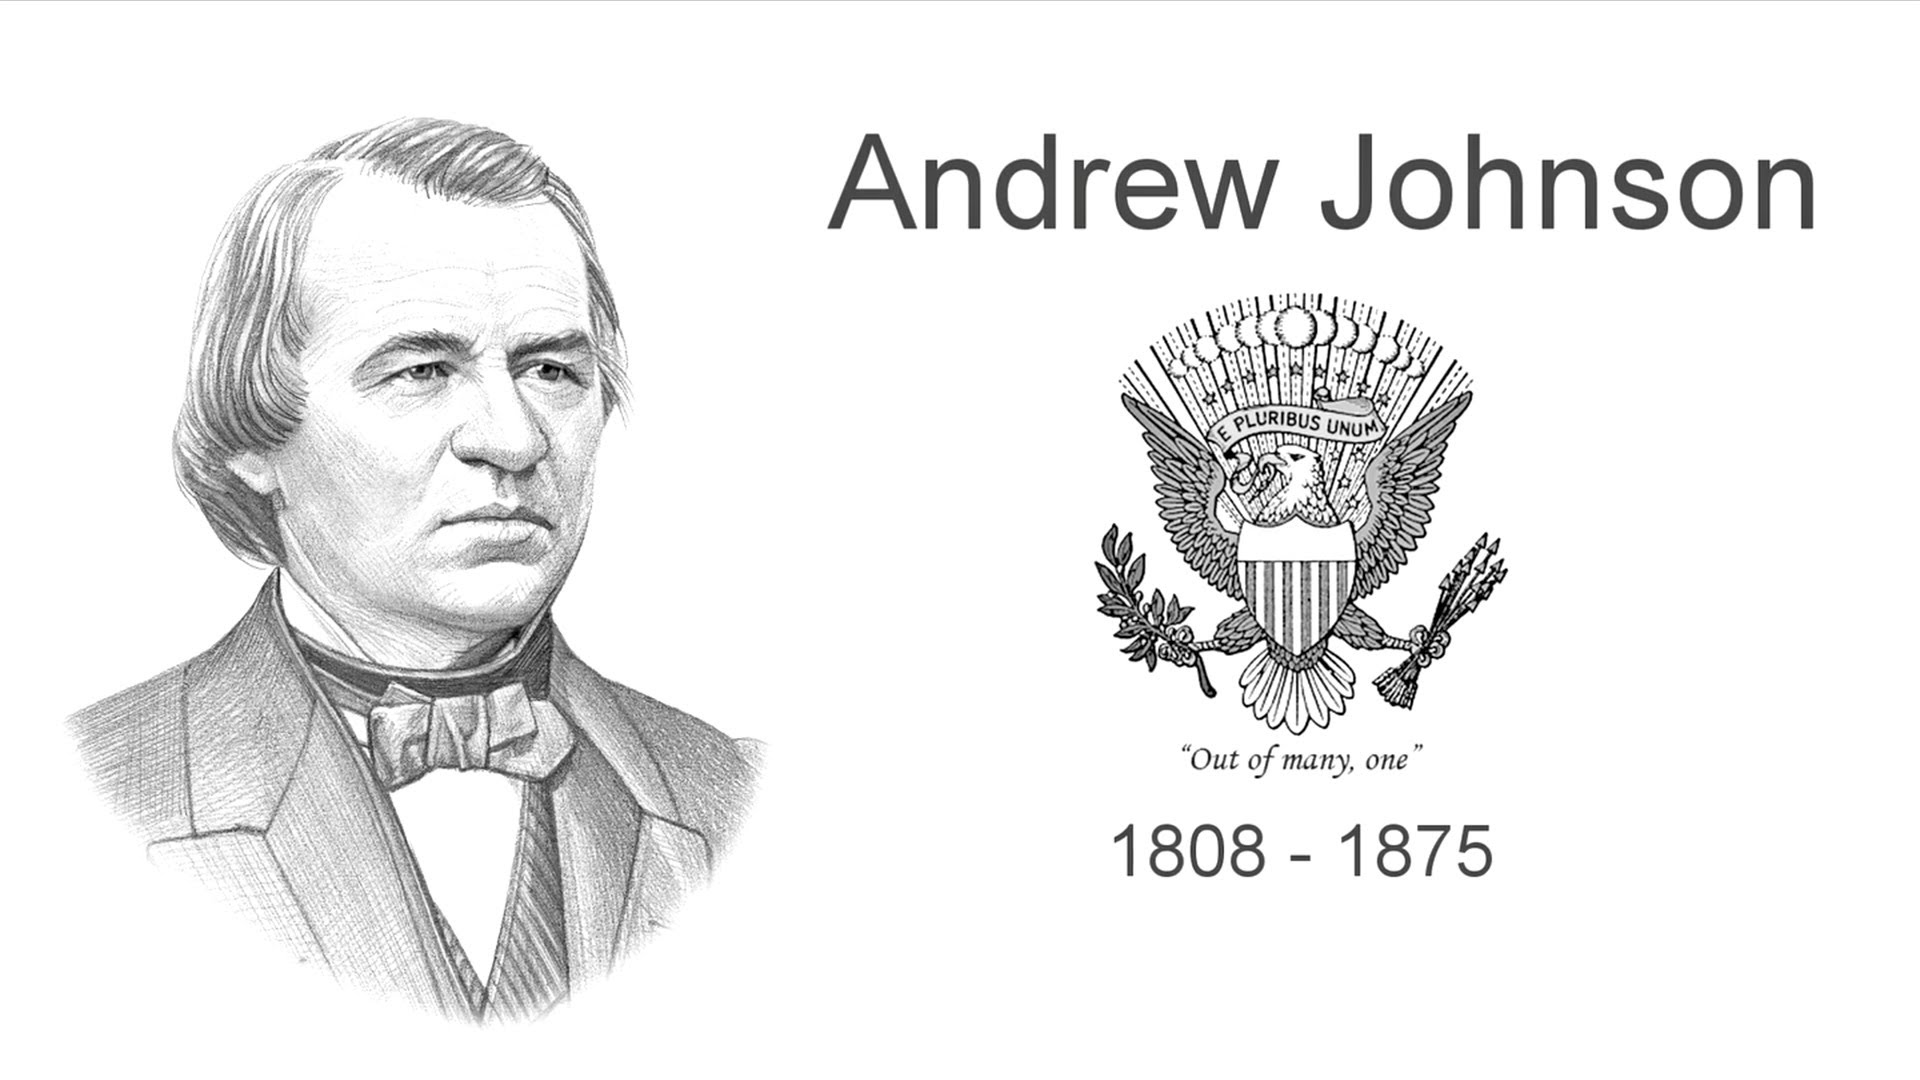 Top 10 Books On Andrew Johnson